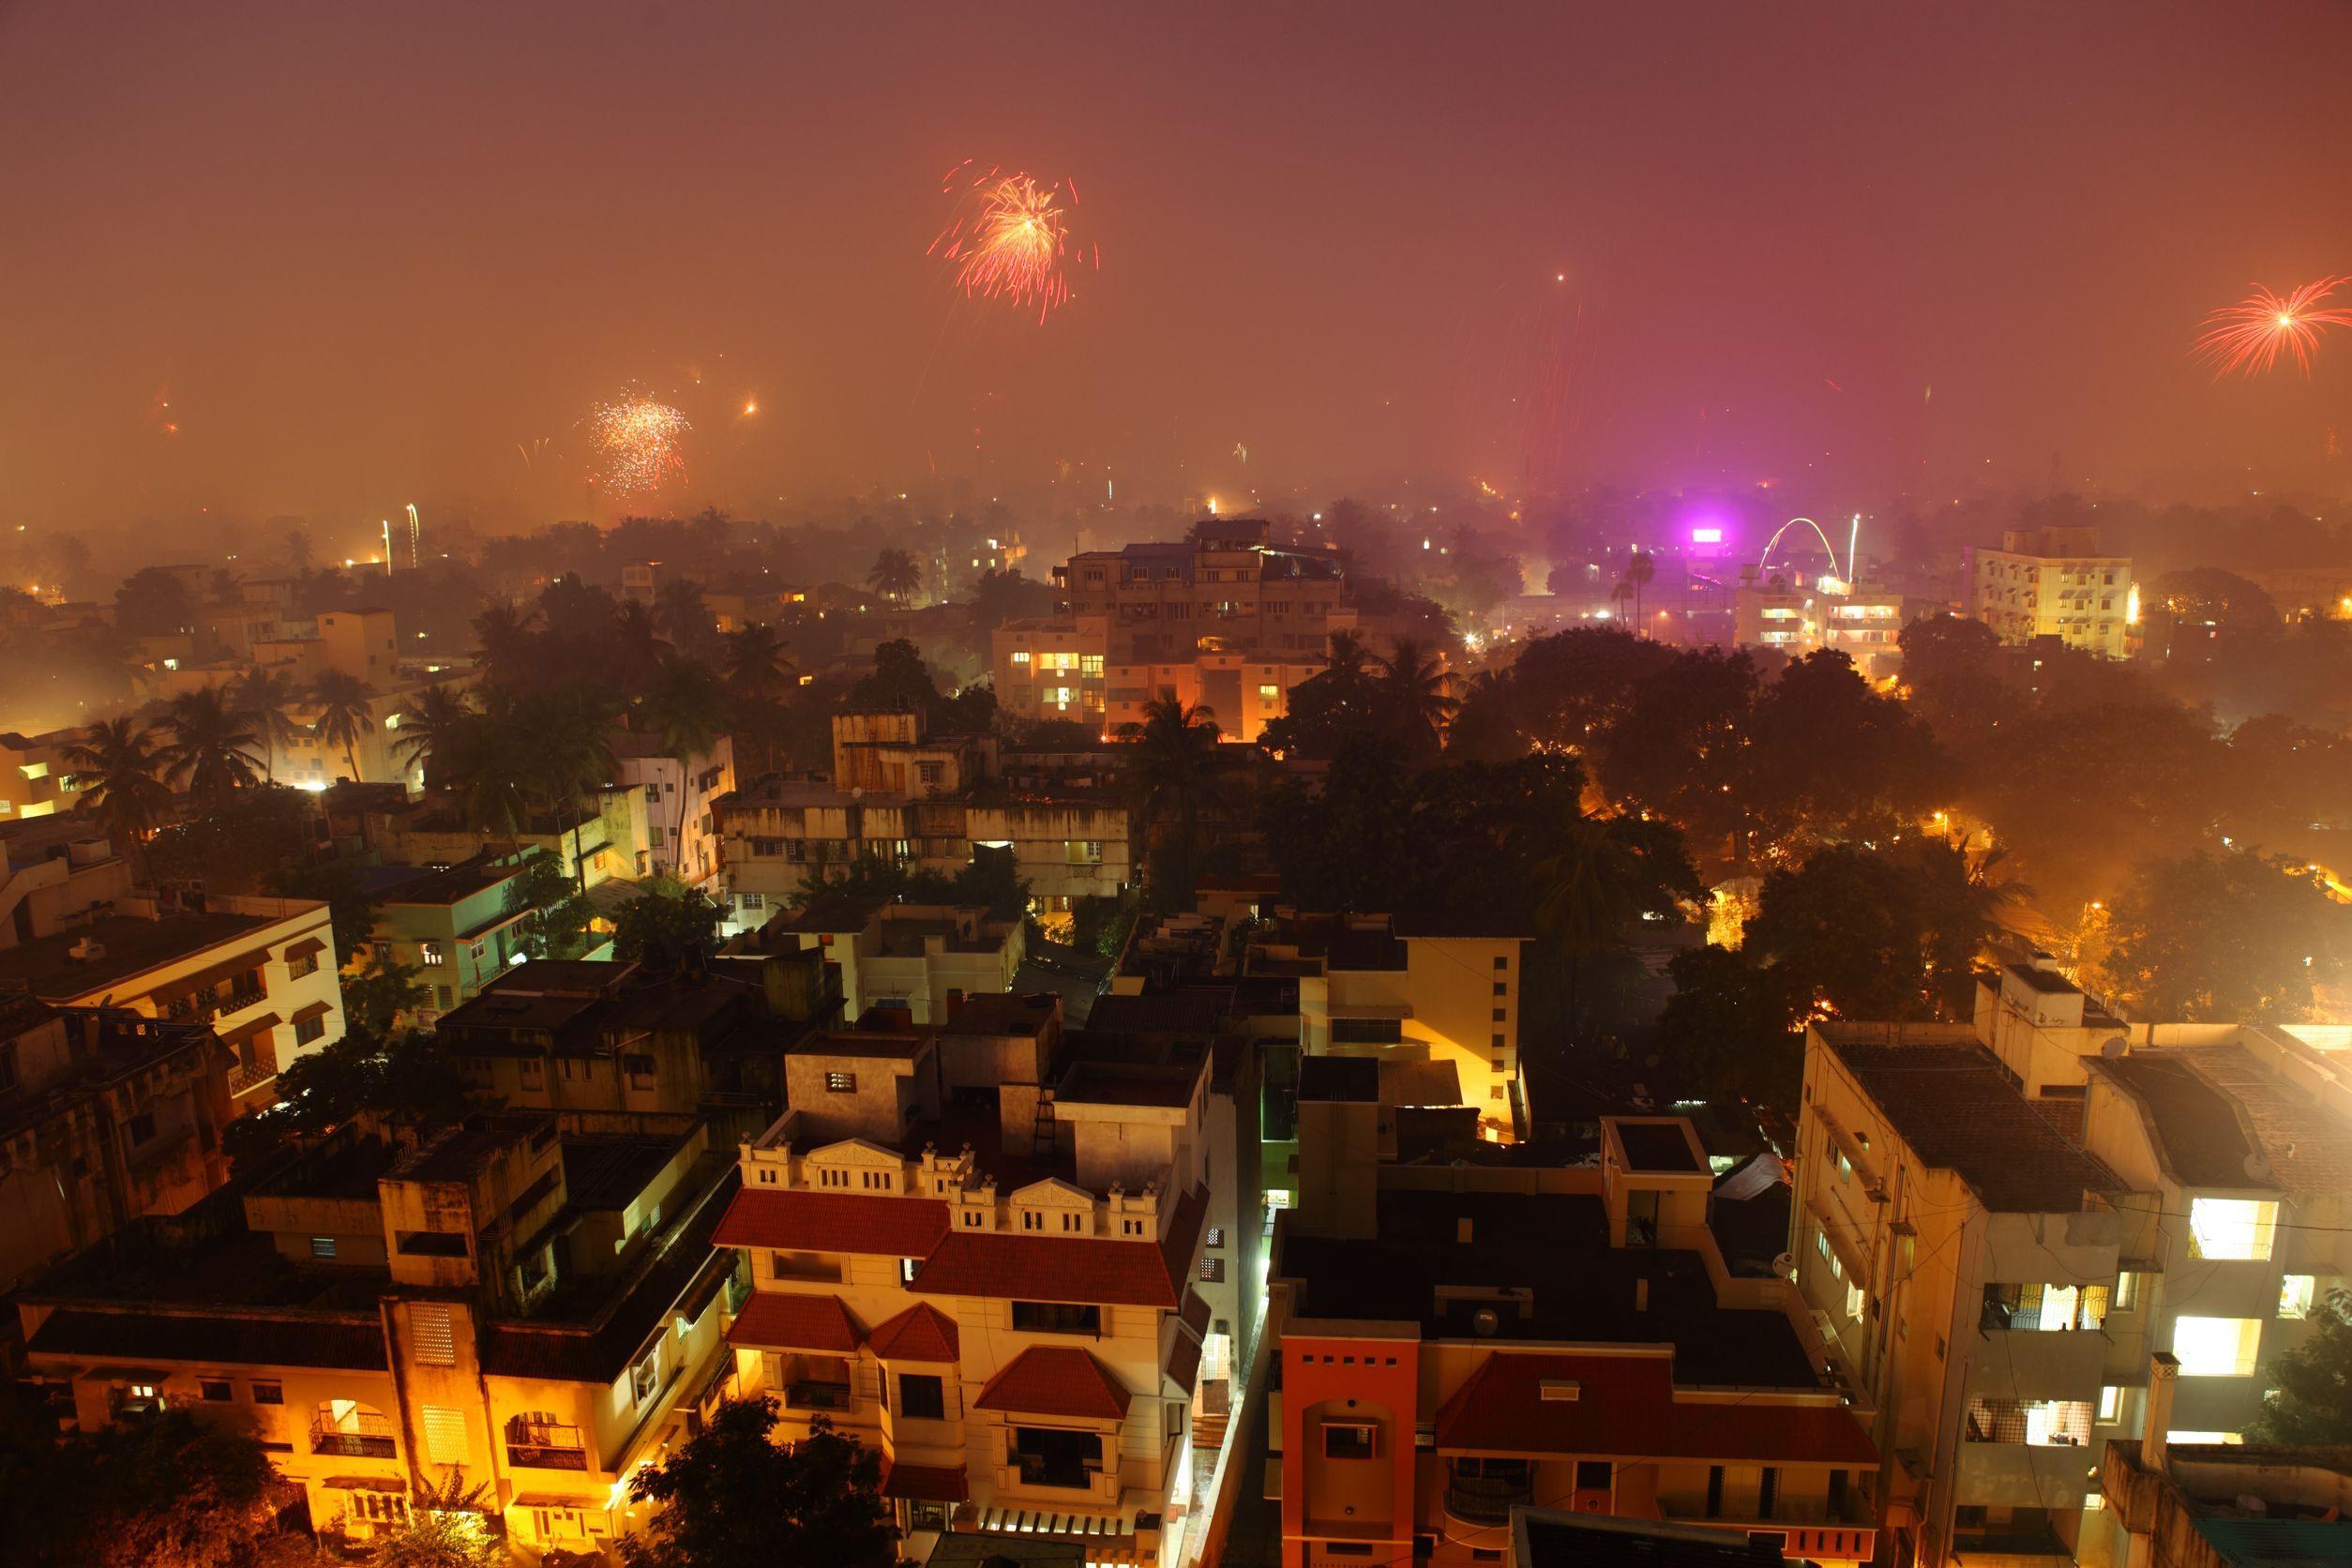 fireworks over Chennai-city-on-Diwali-night-India